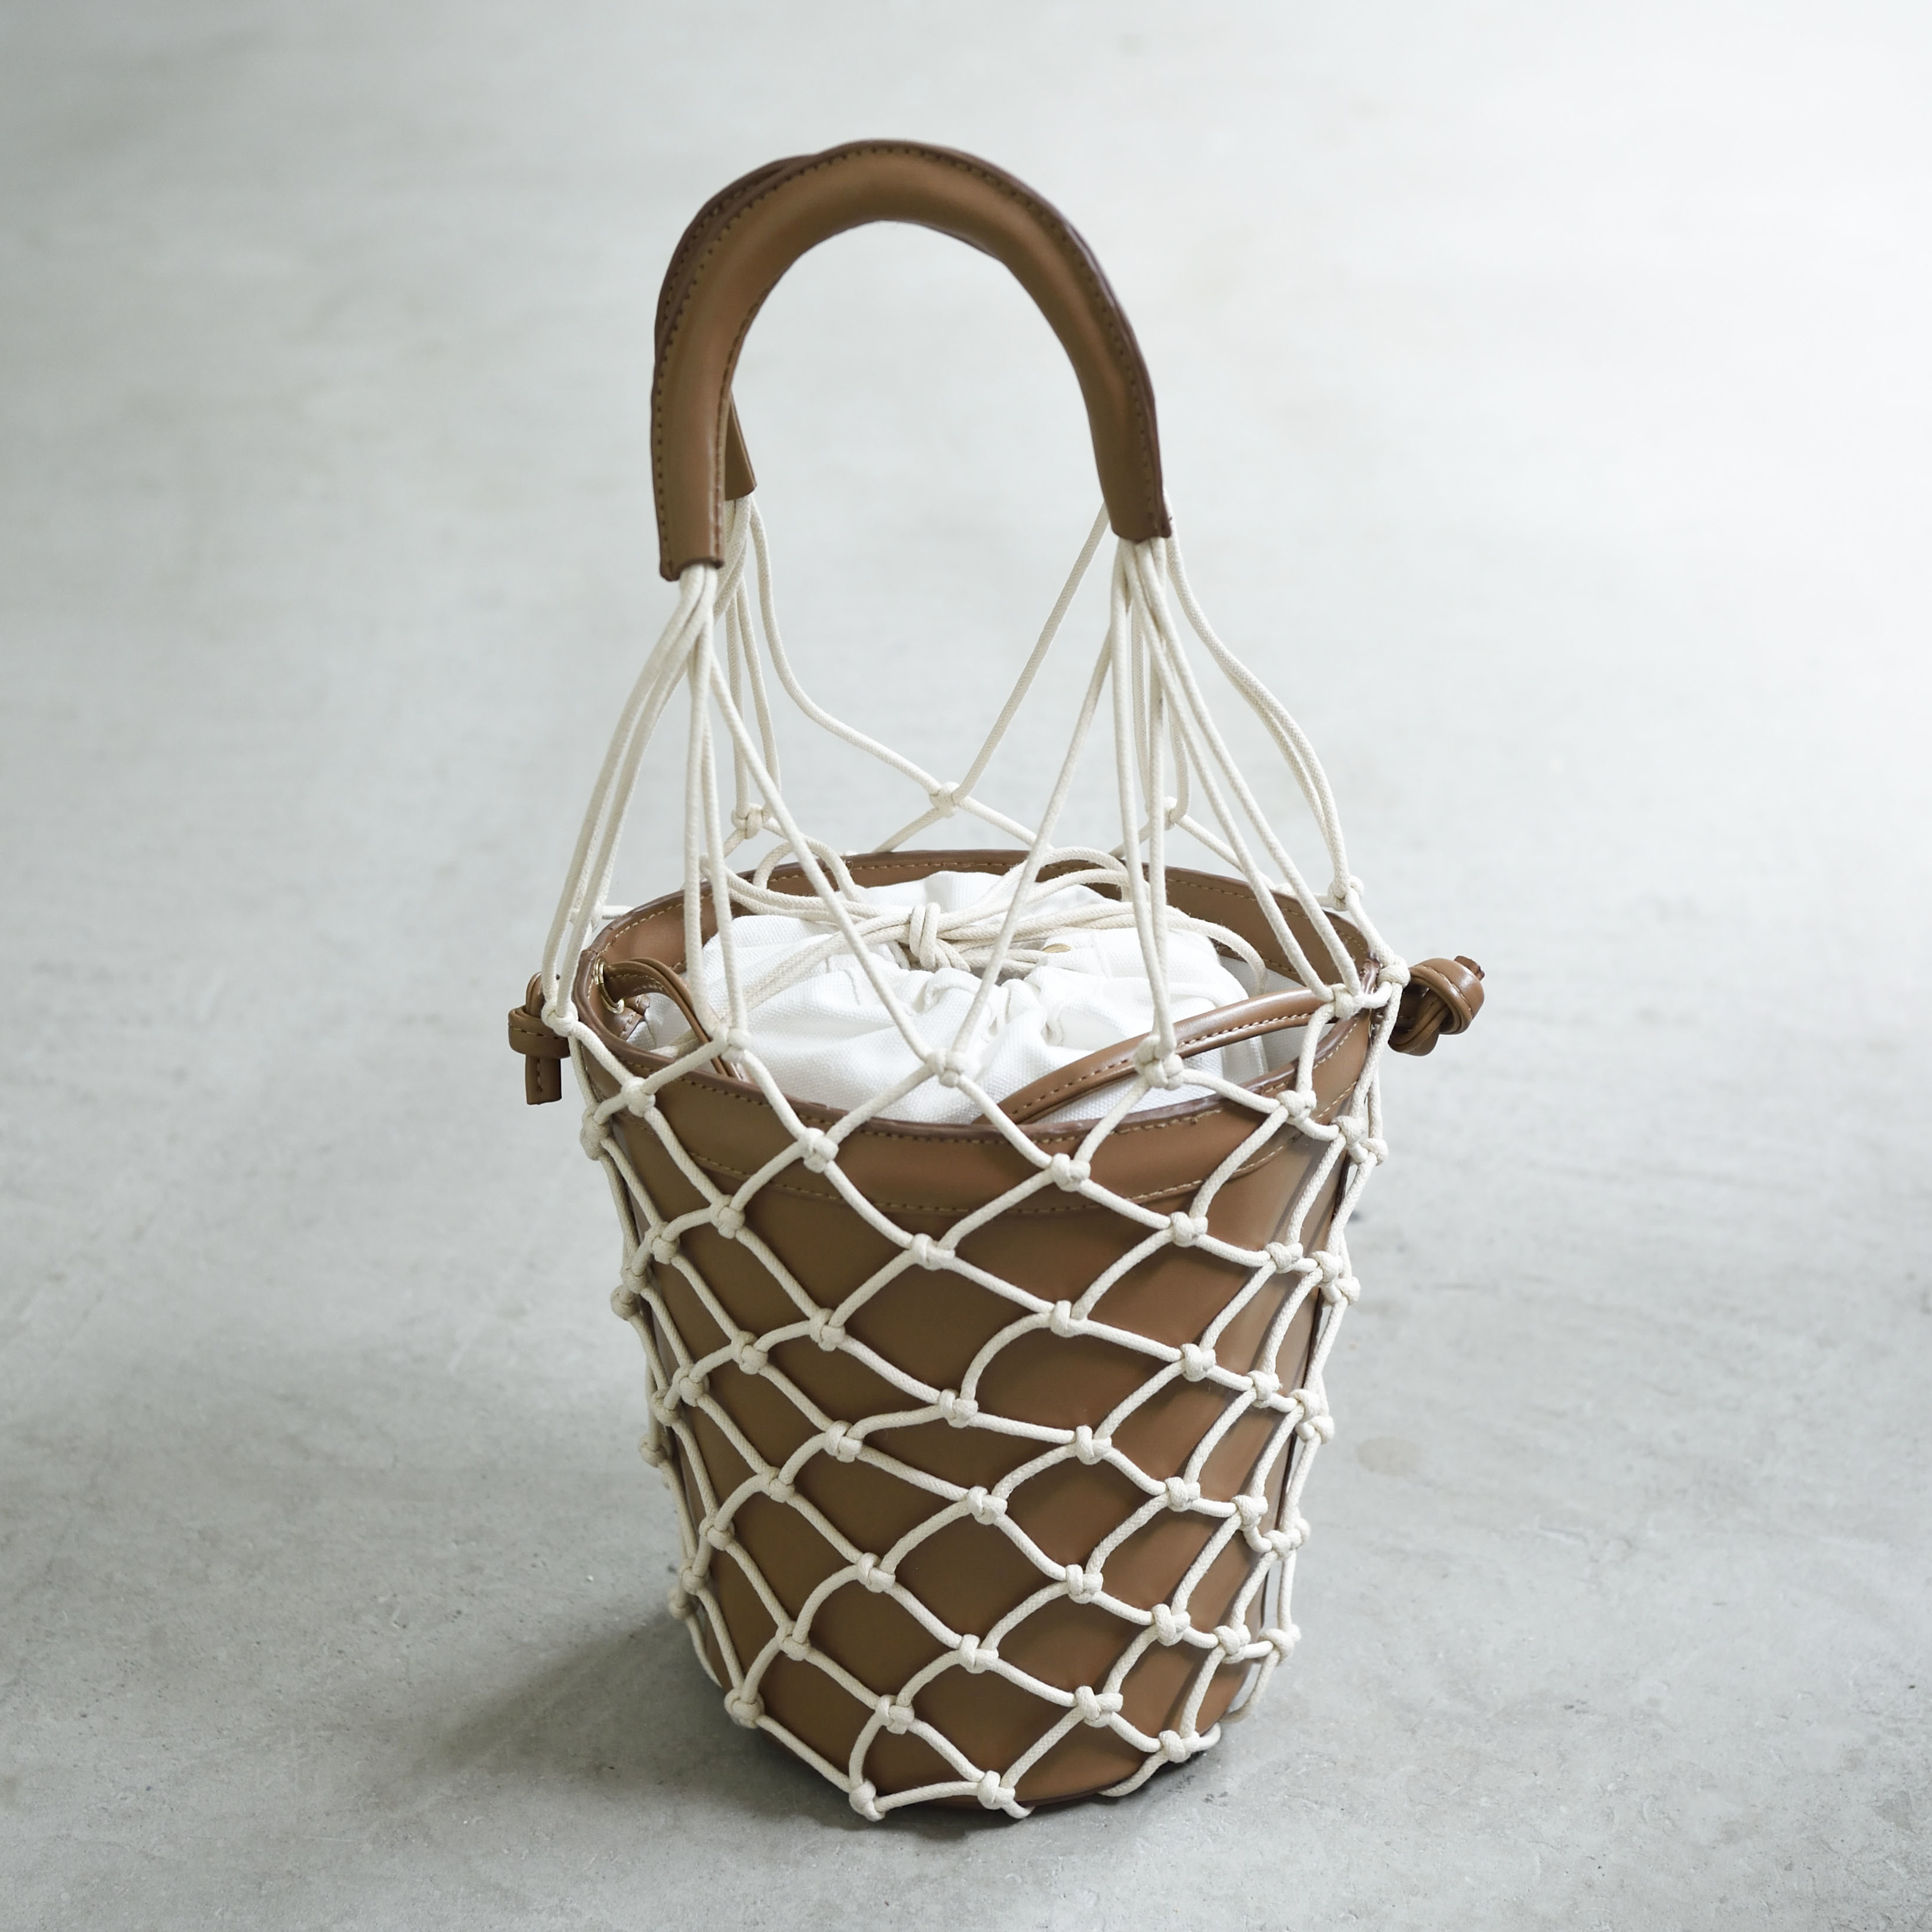 【Mesh-Leather-Basket 】Brown